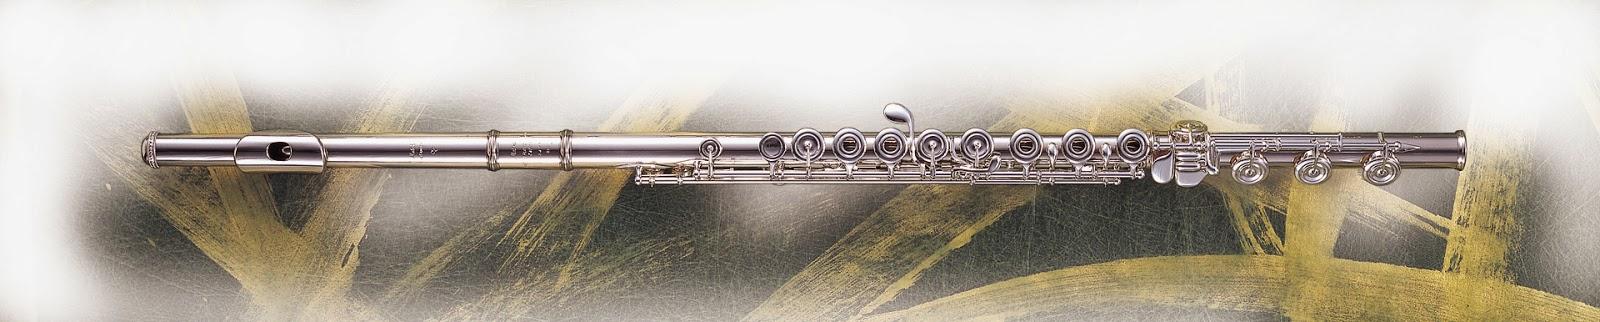 muramatsu flûte occasion